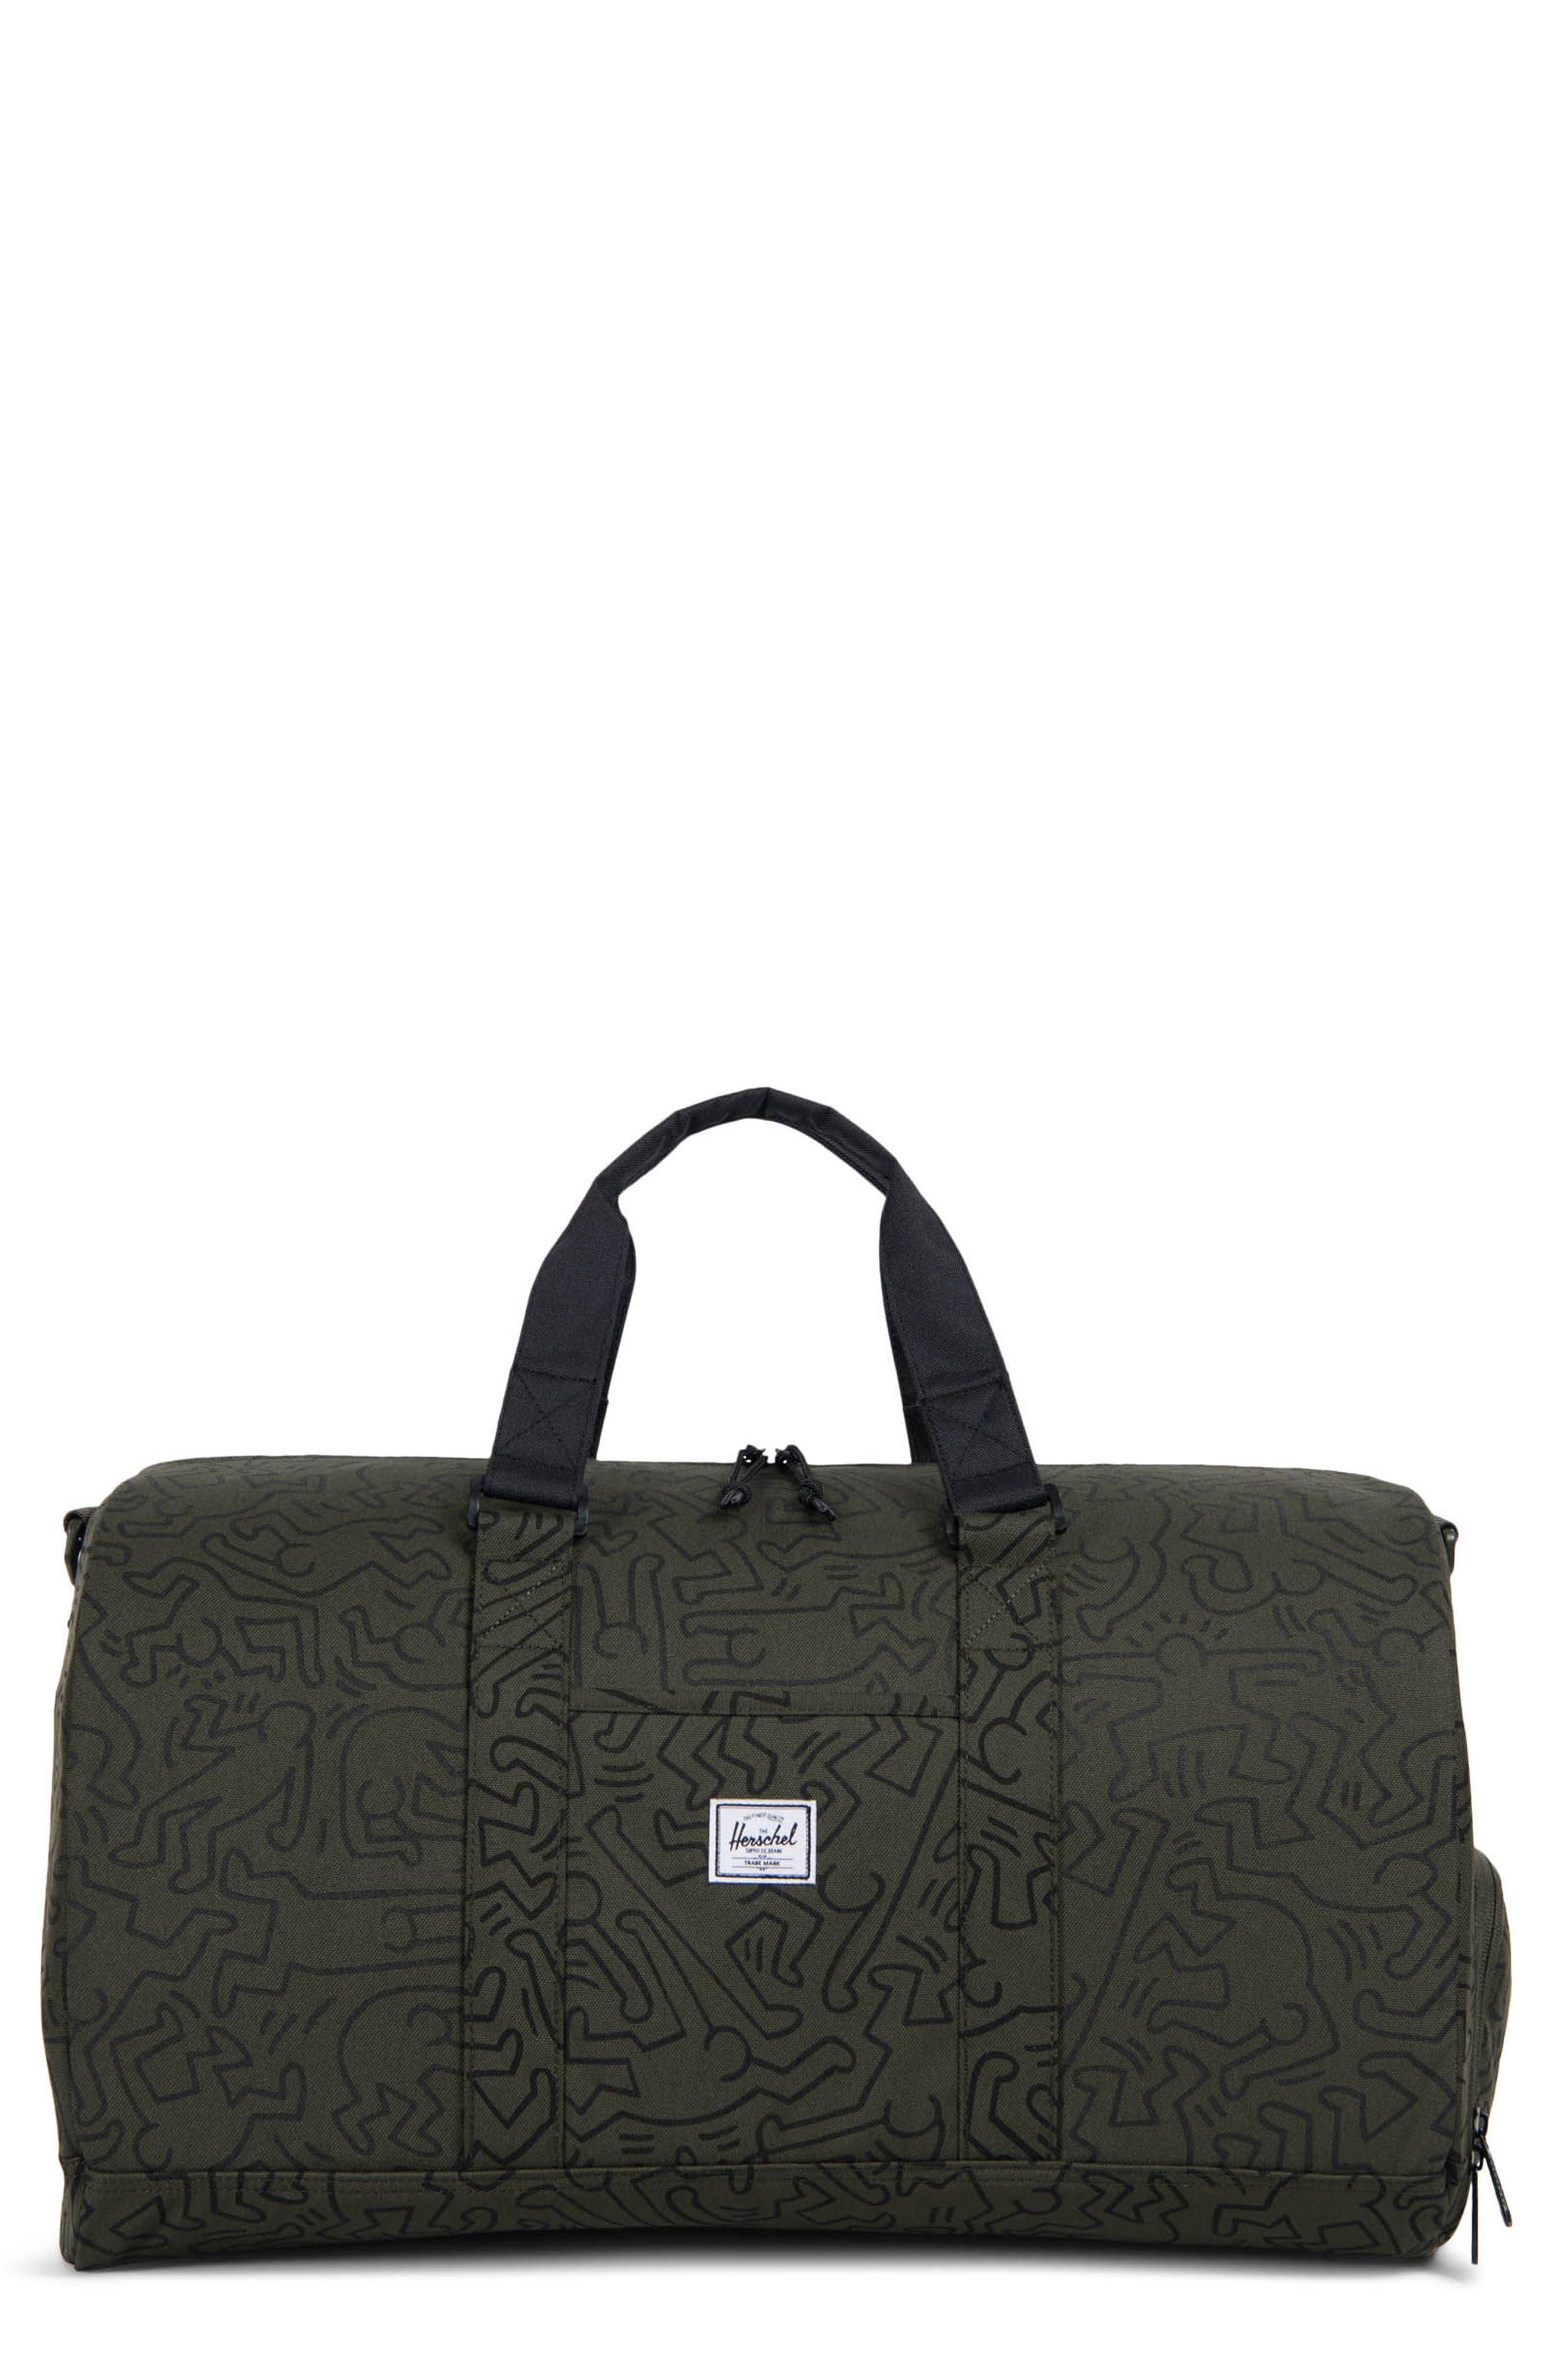 Herschel Supply Co. Novel x Keith Haring Duffel Bag